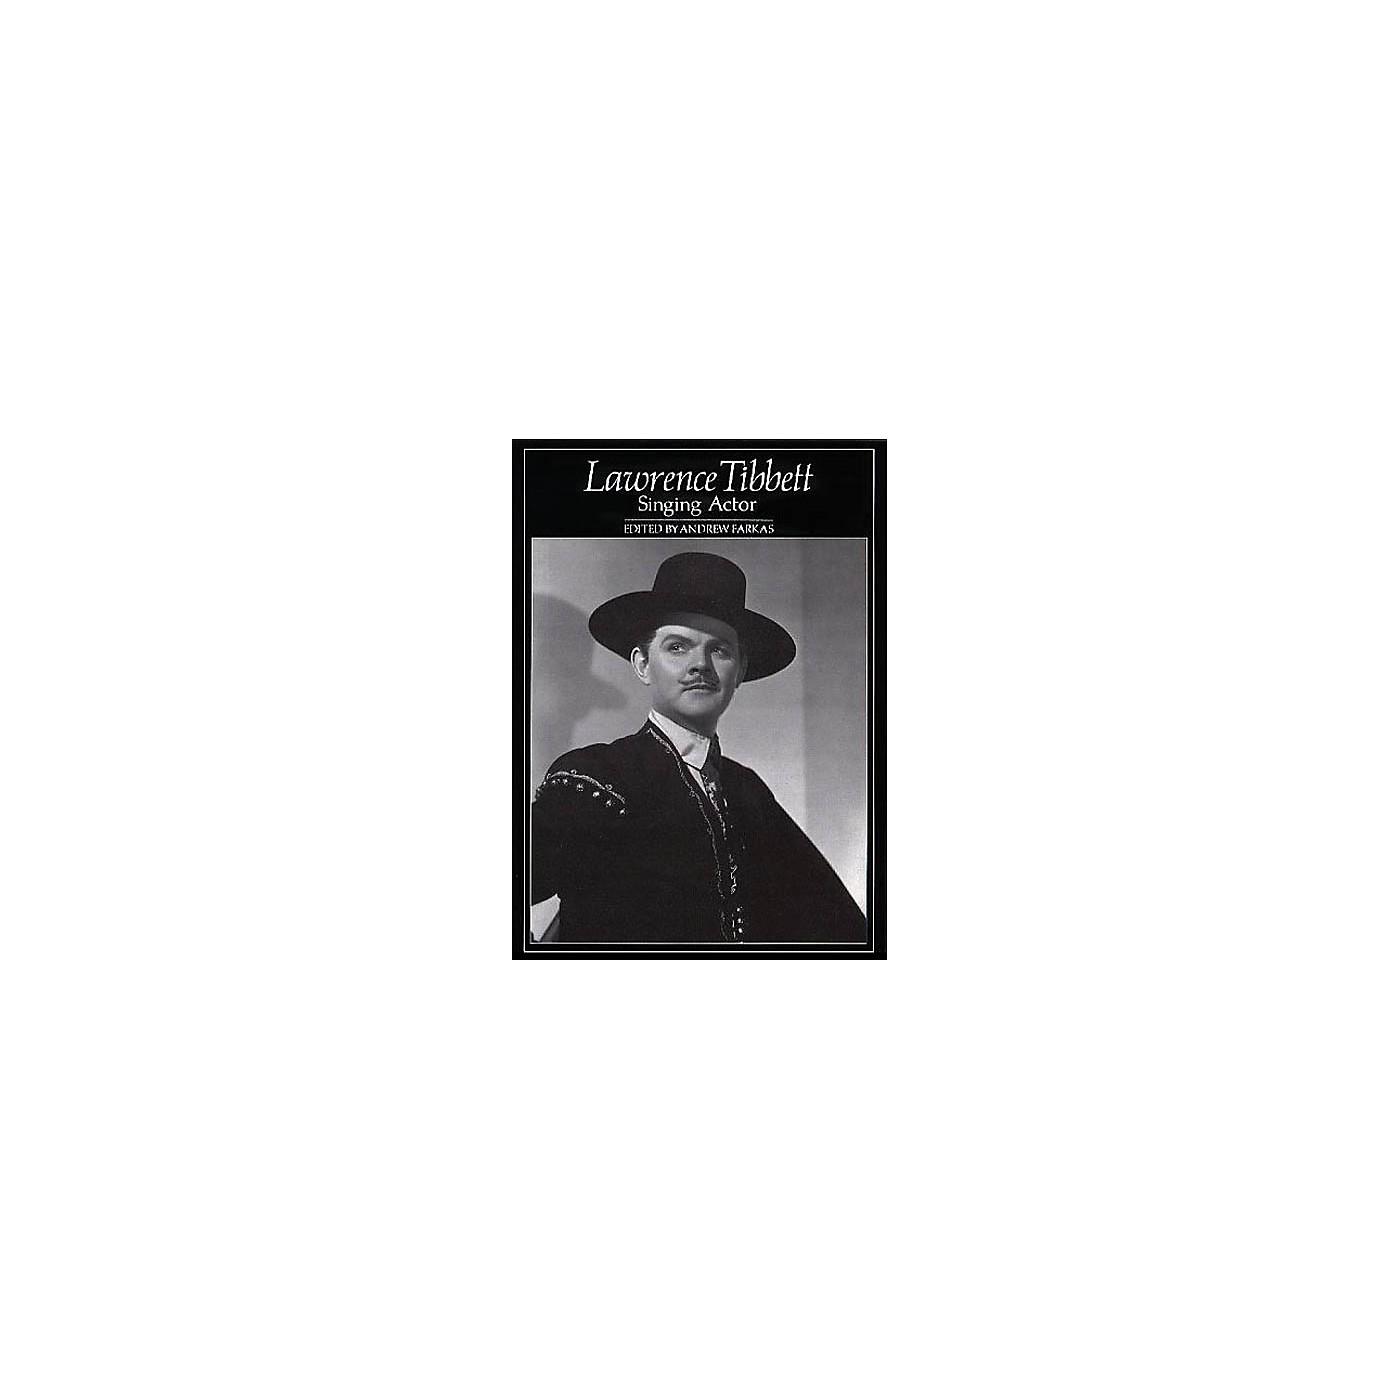 Amadeus Press Lawrence Tibbett (Singing Actor) Amadeus Series Hardcover thumbnail